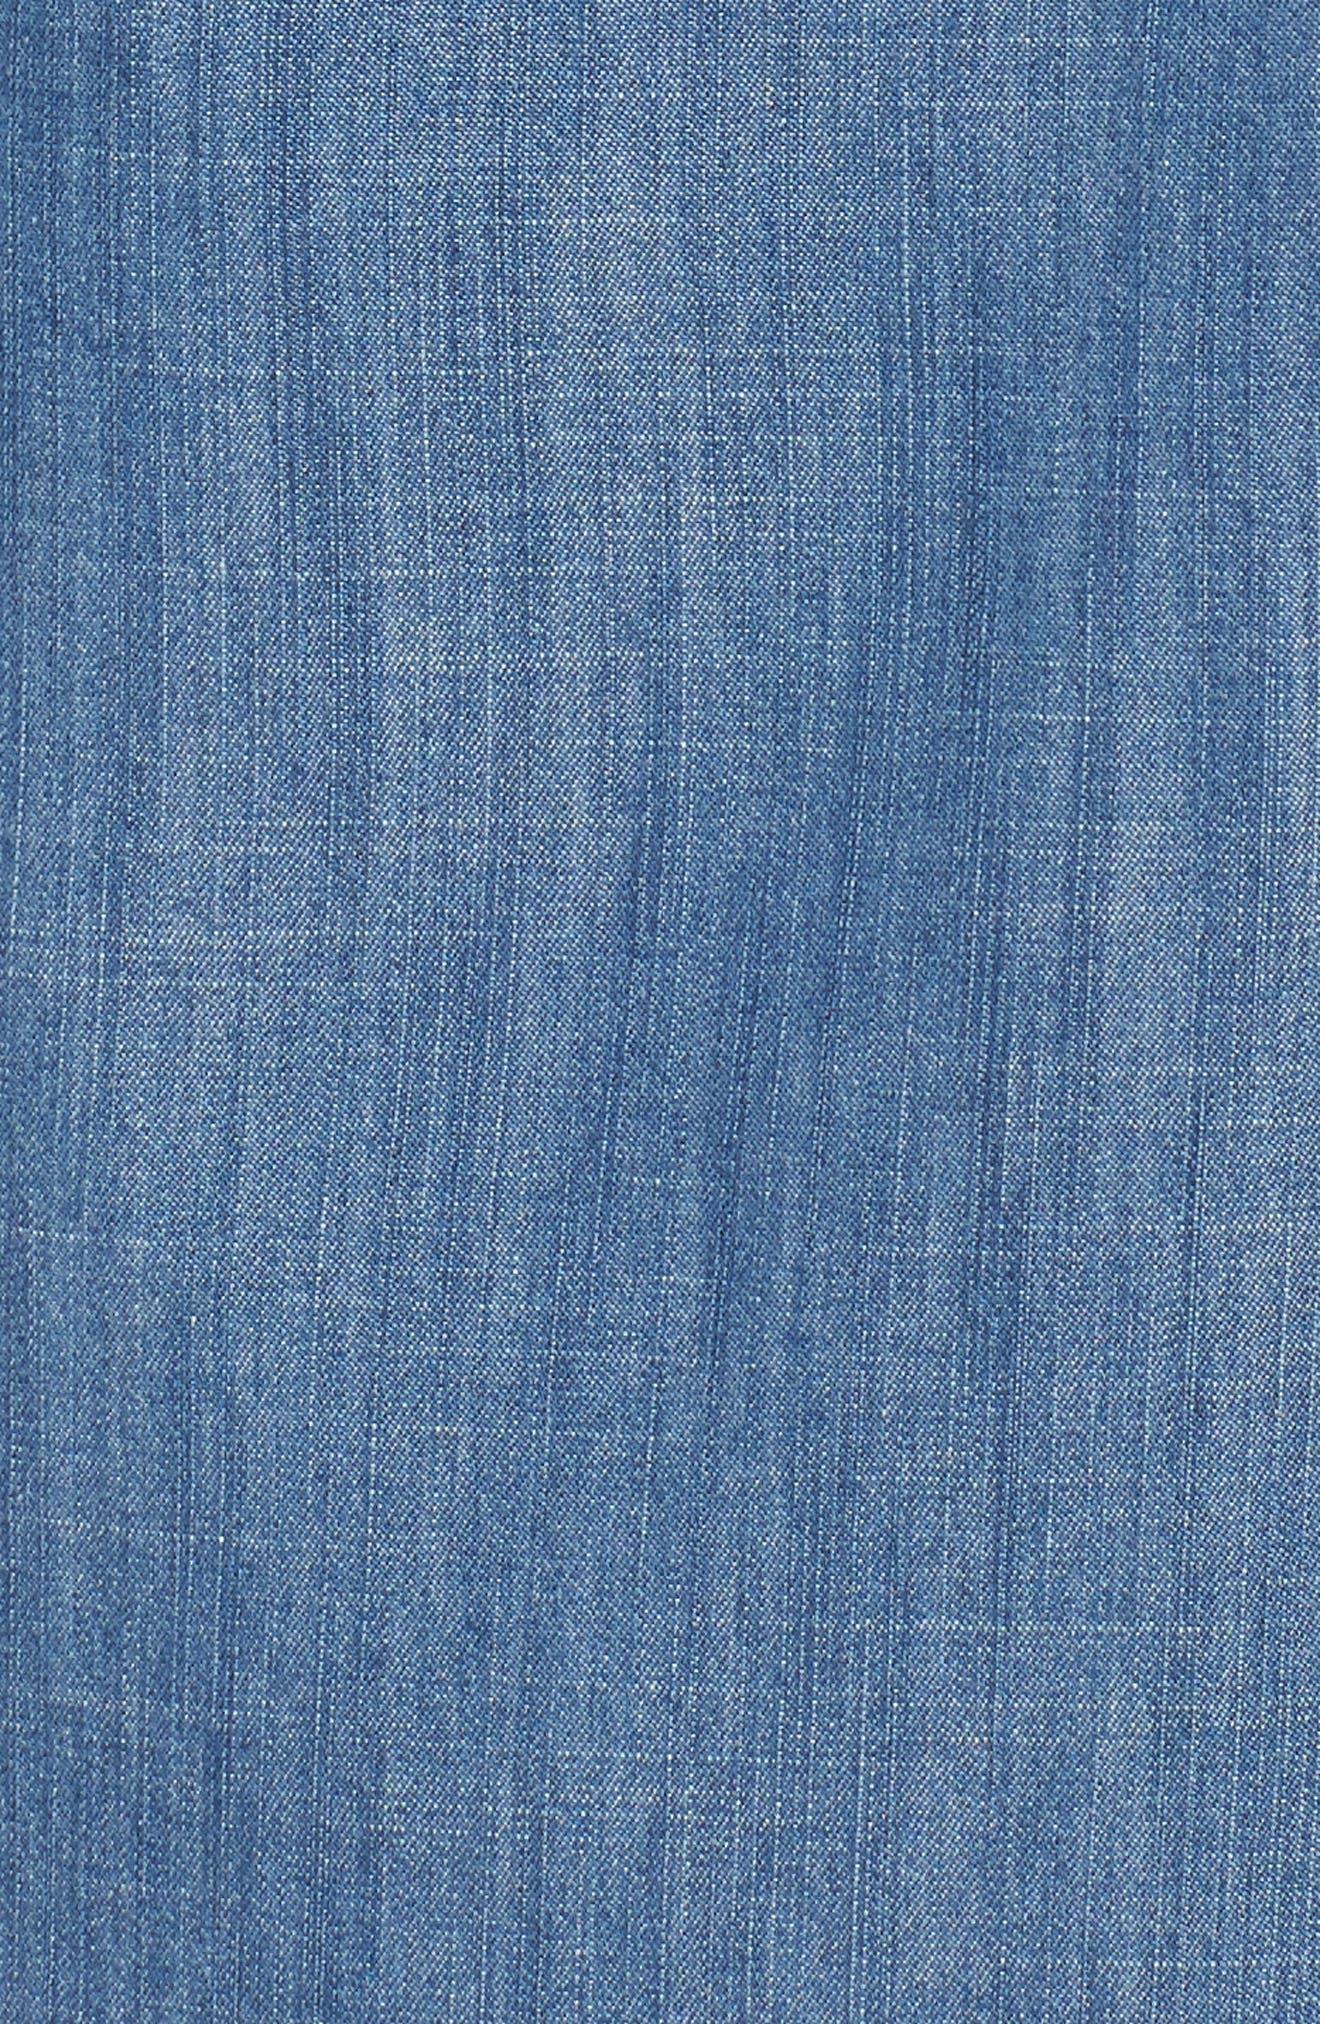 Dorado Keyhole Chambray Dress,                             Alternate thumbnail 5, color,                             Norton Wash